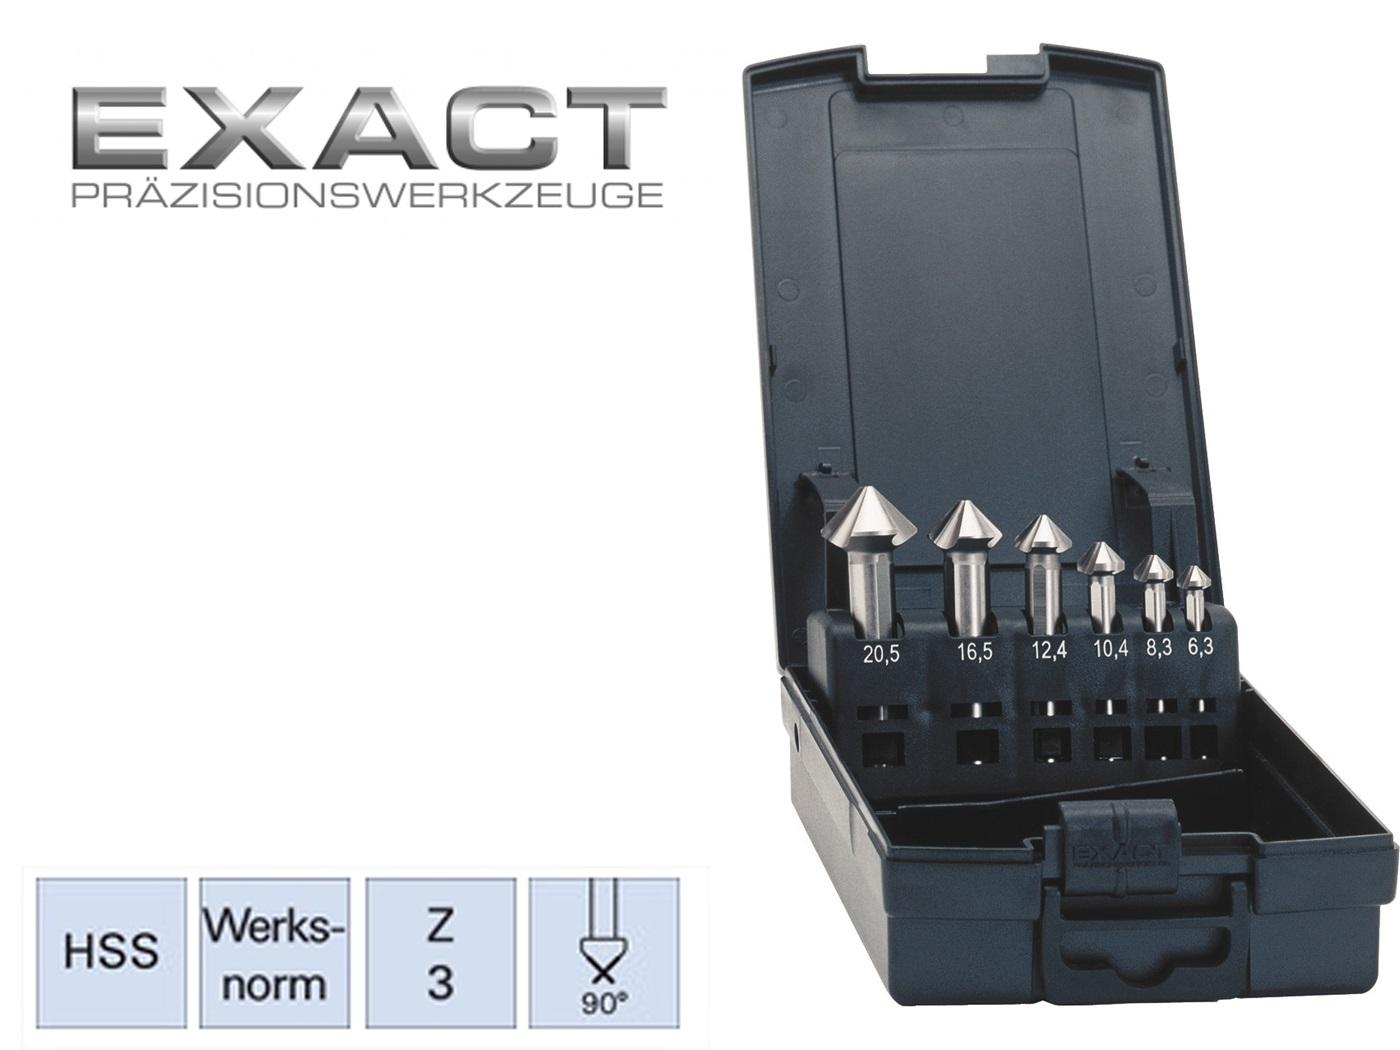 verzinkboor set DIN 335C HSS ADVANCED exact | DKMTools - DKM Tools